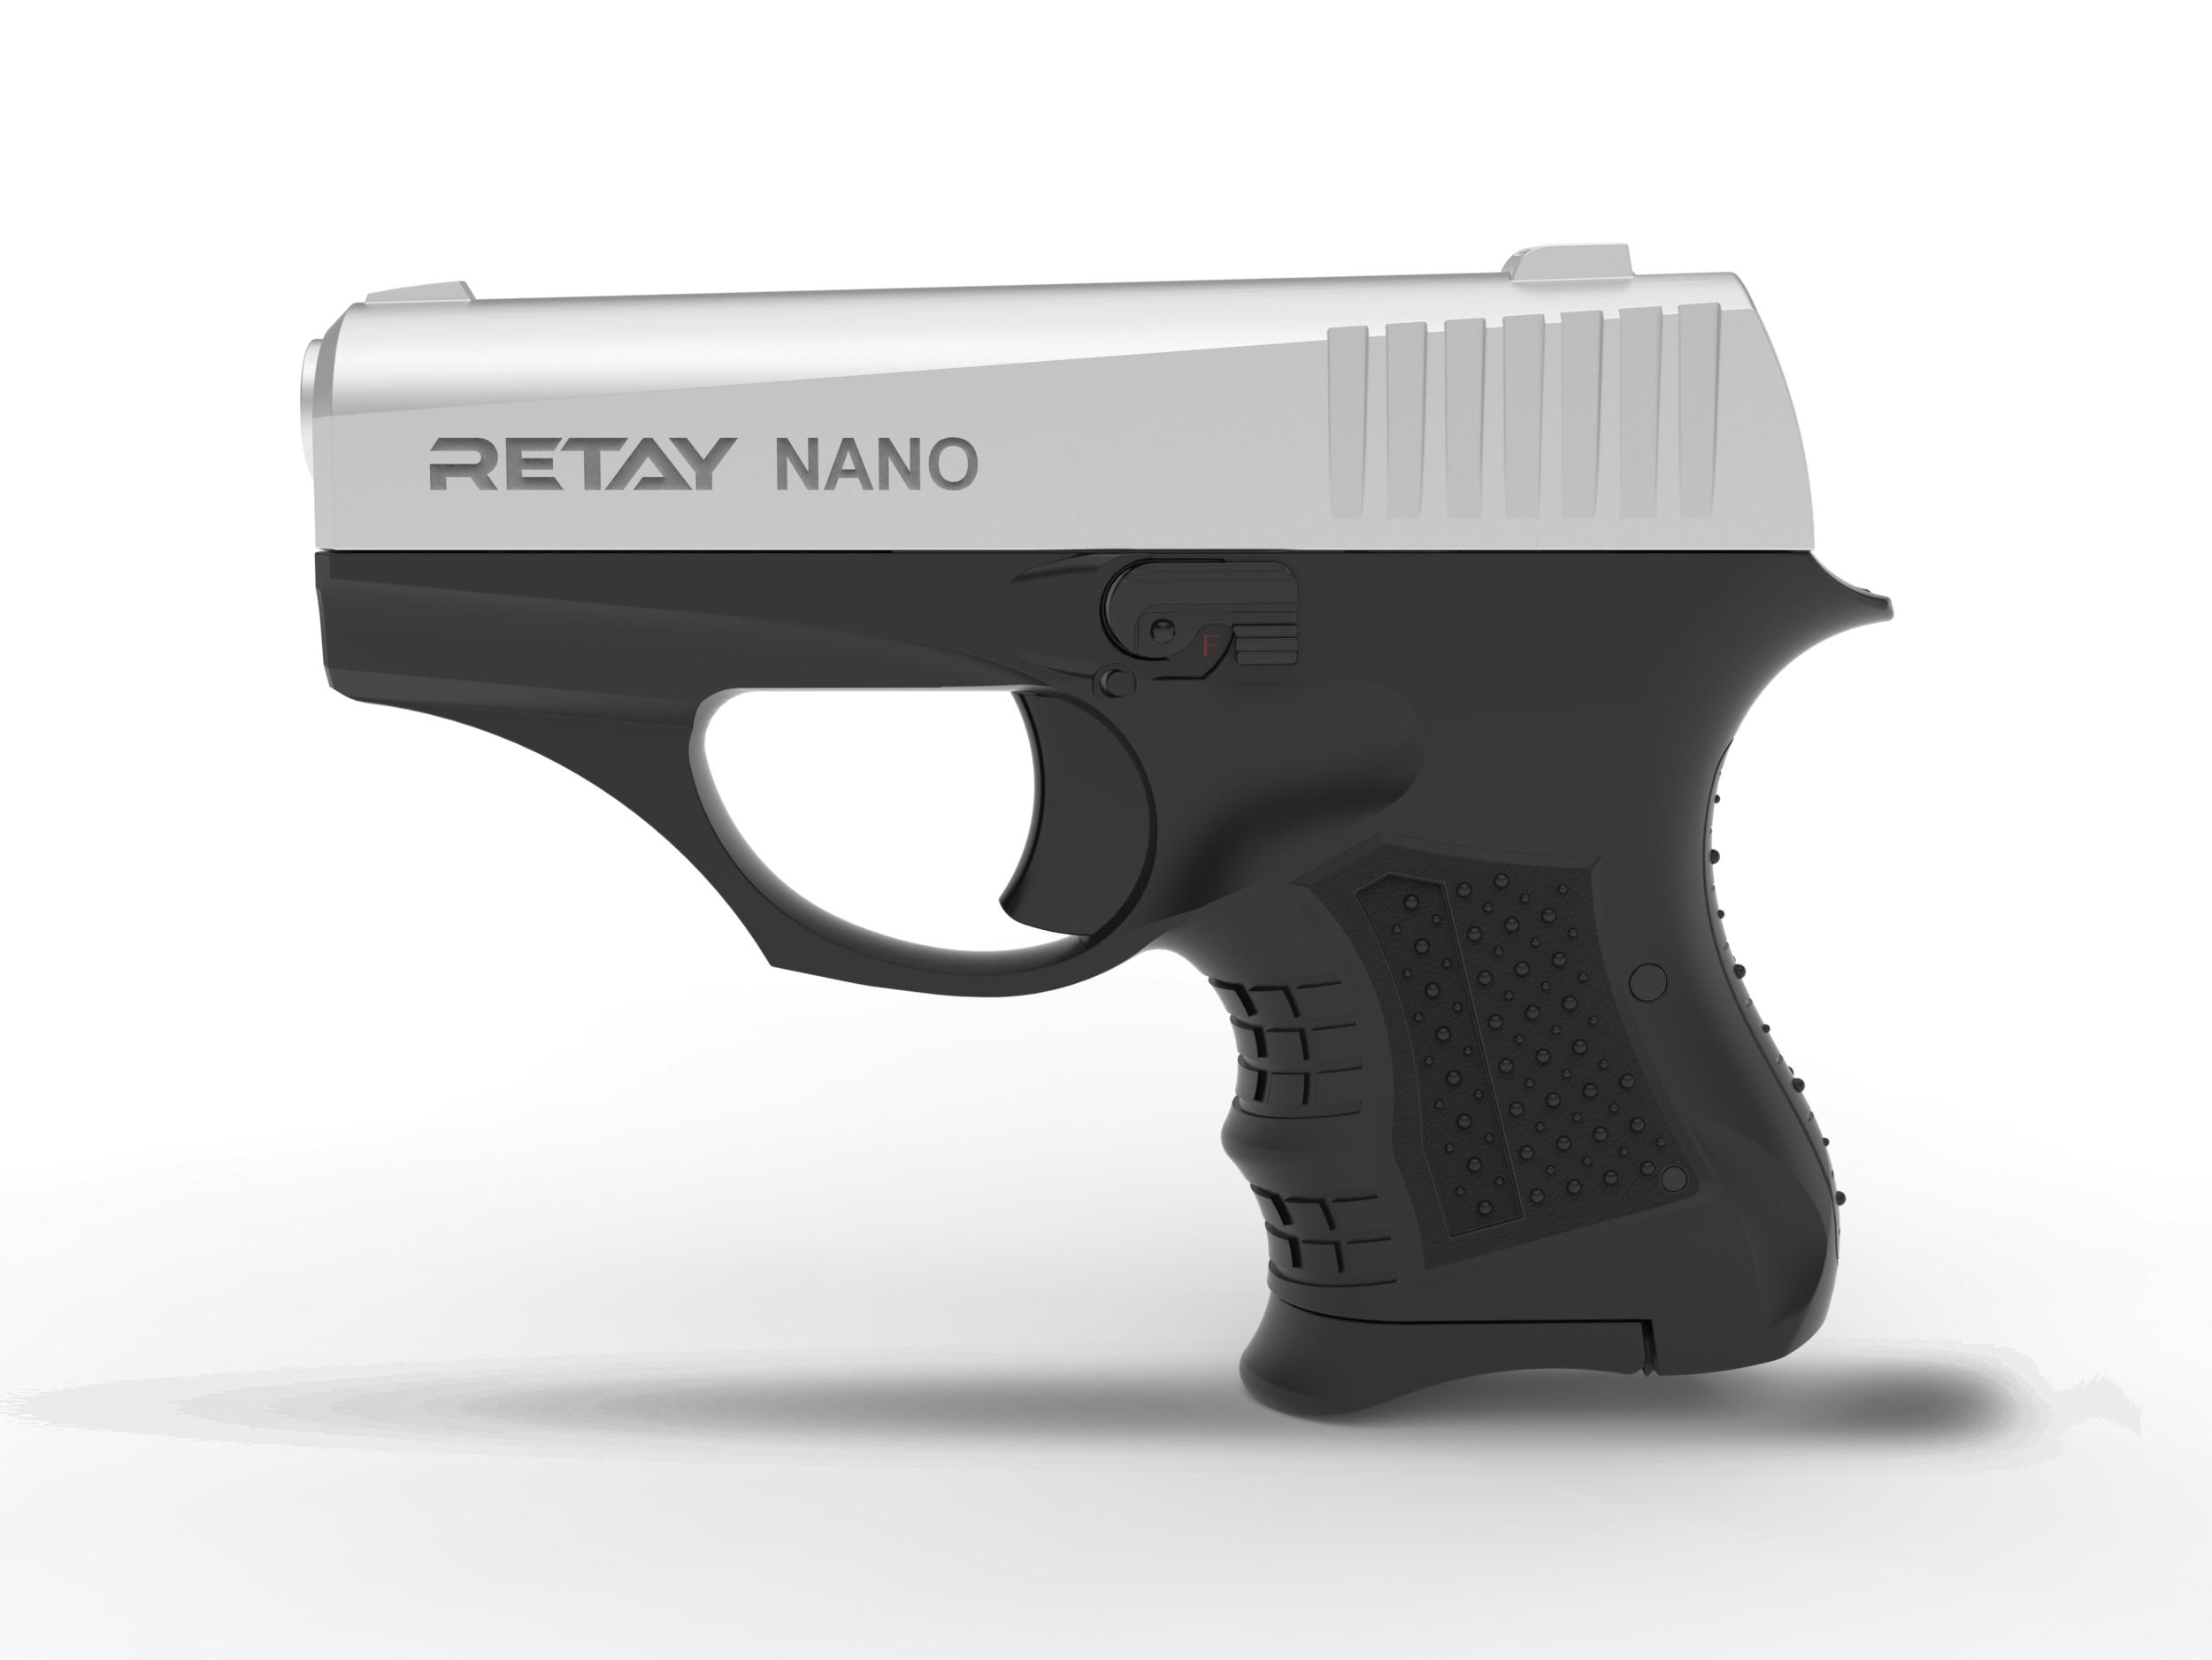 Retay nano chrome